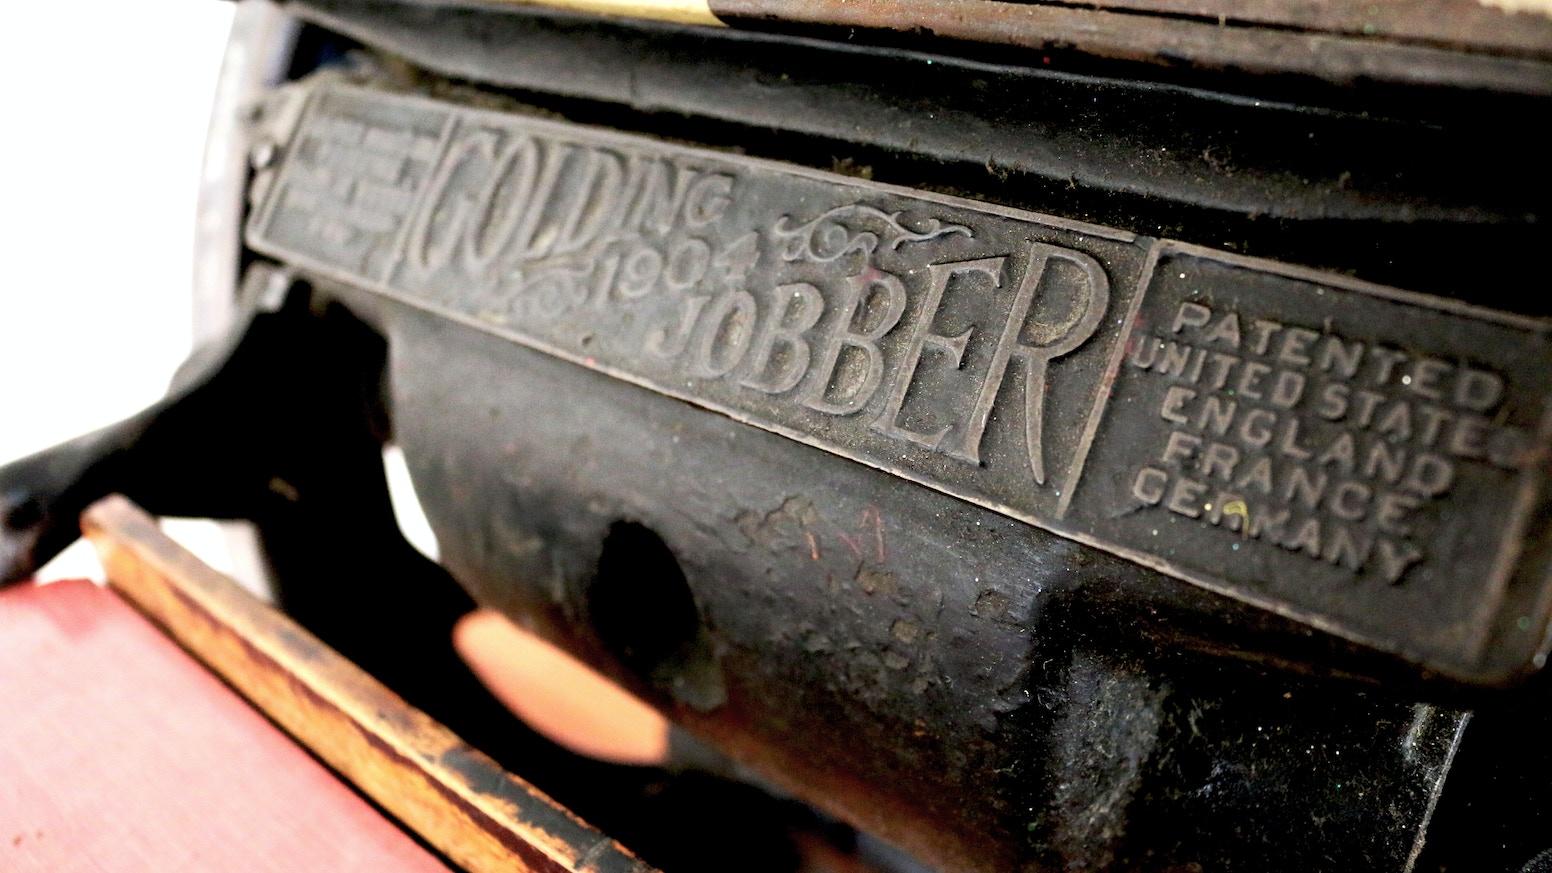 Quick Brown Fox Letterpress A Restoration Project